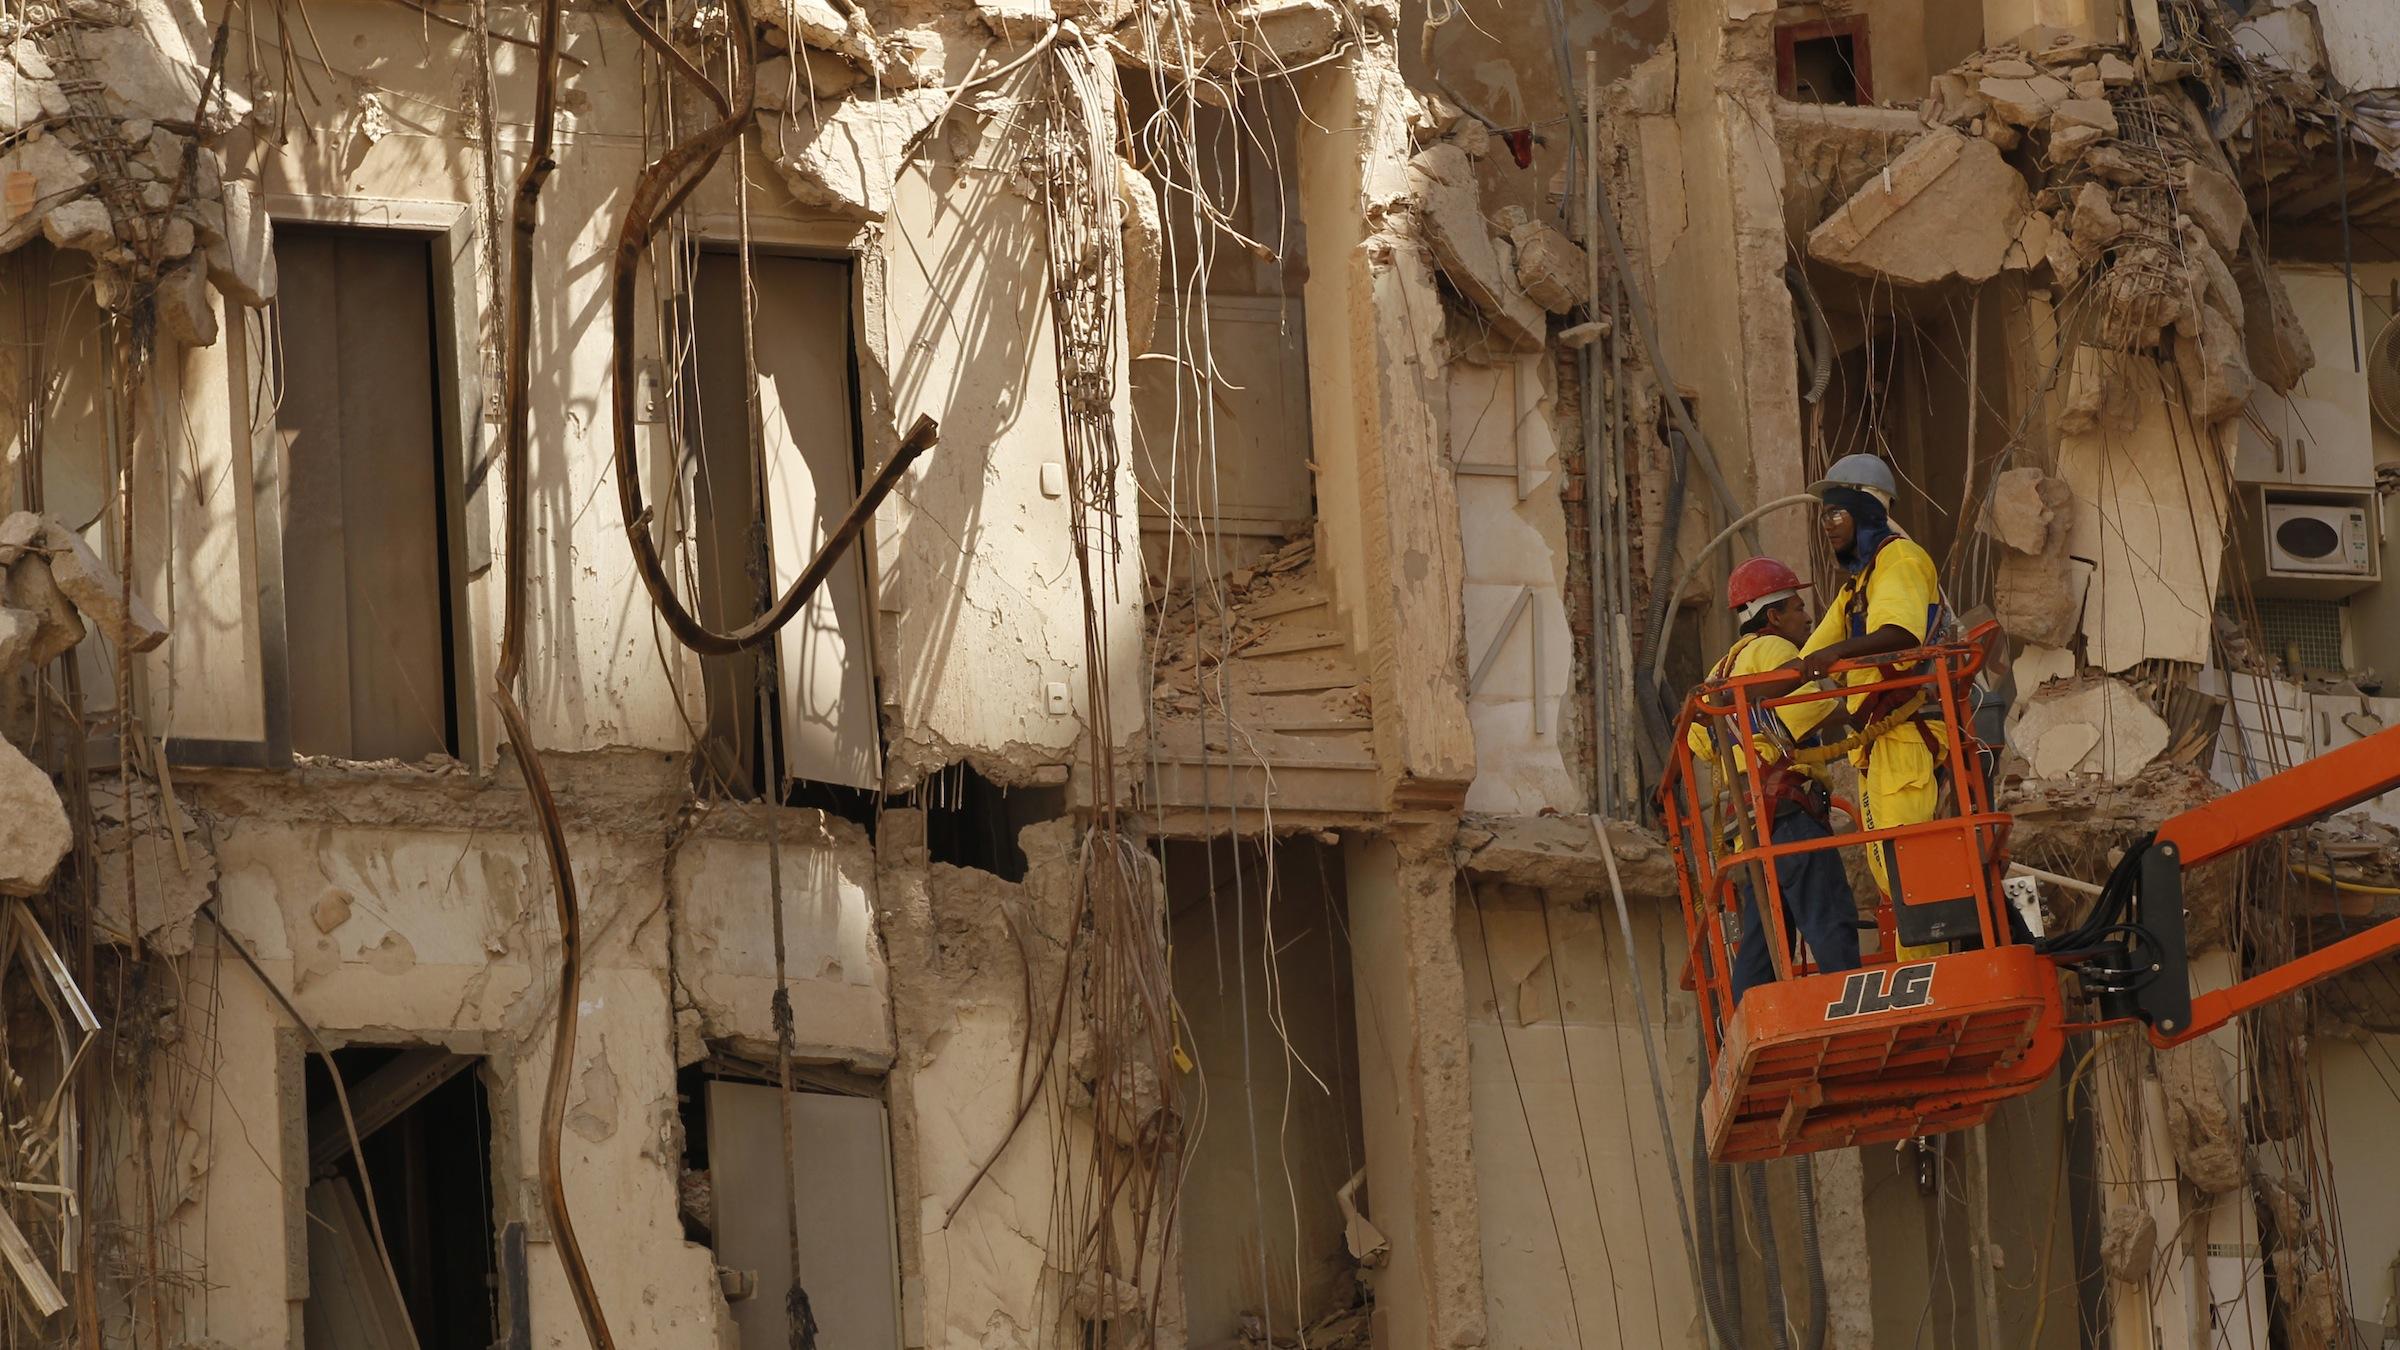 Crumbling building in Rio de Janeiro